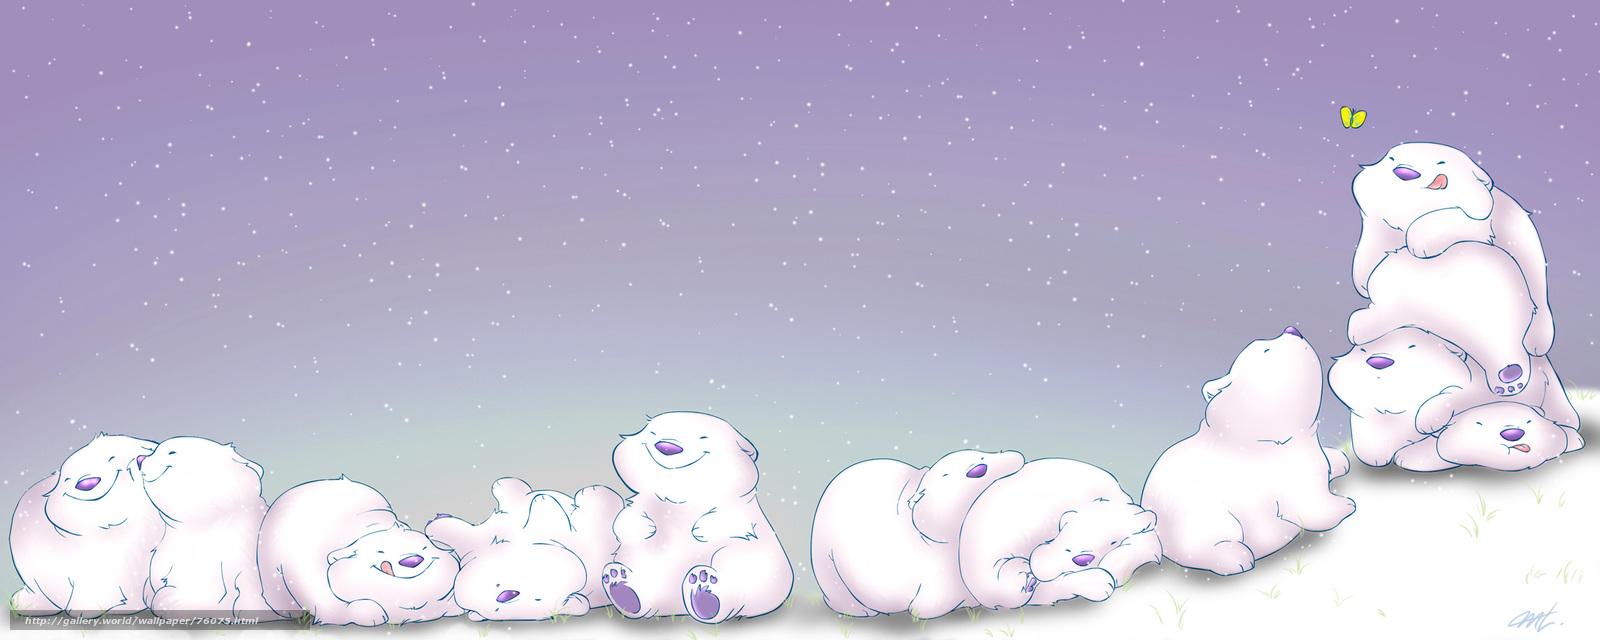 Скачать обои мишки, бабочка, снег ...: ru.gde-fon.com/download/mishki_babochka_sneg/76075/2560x1024